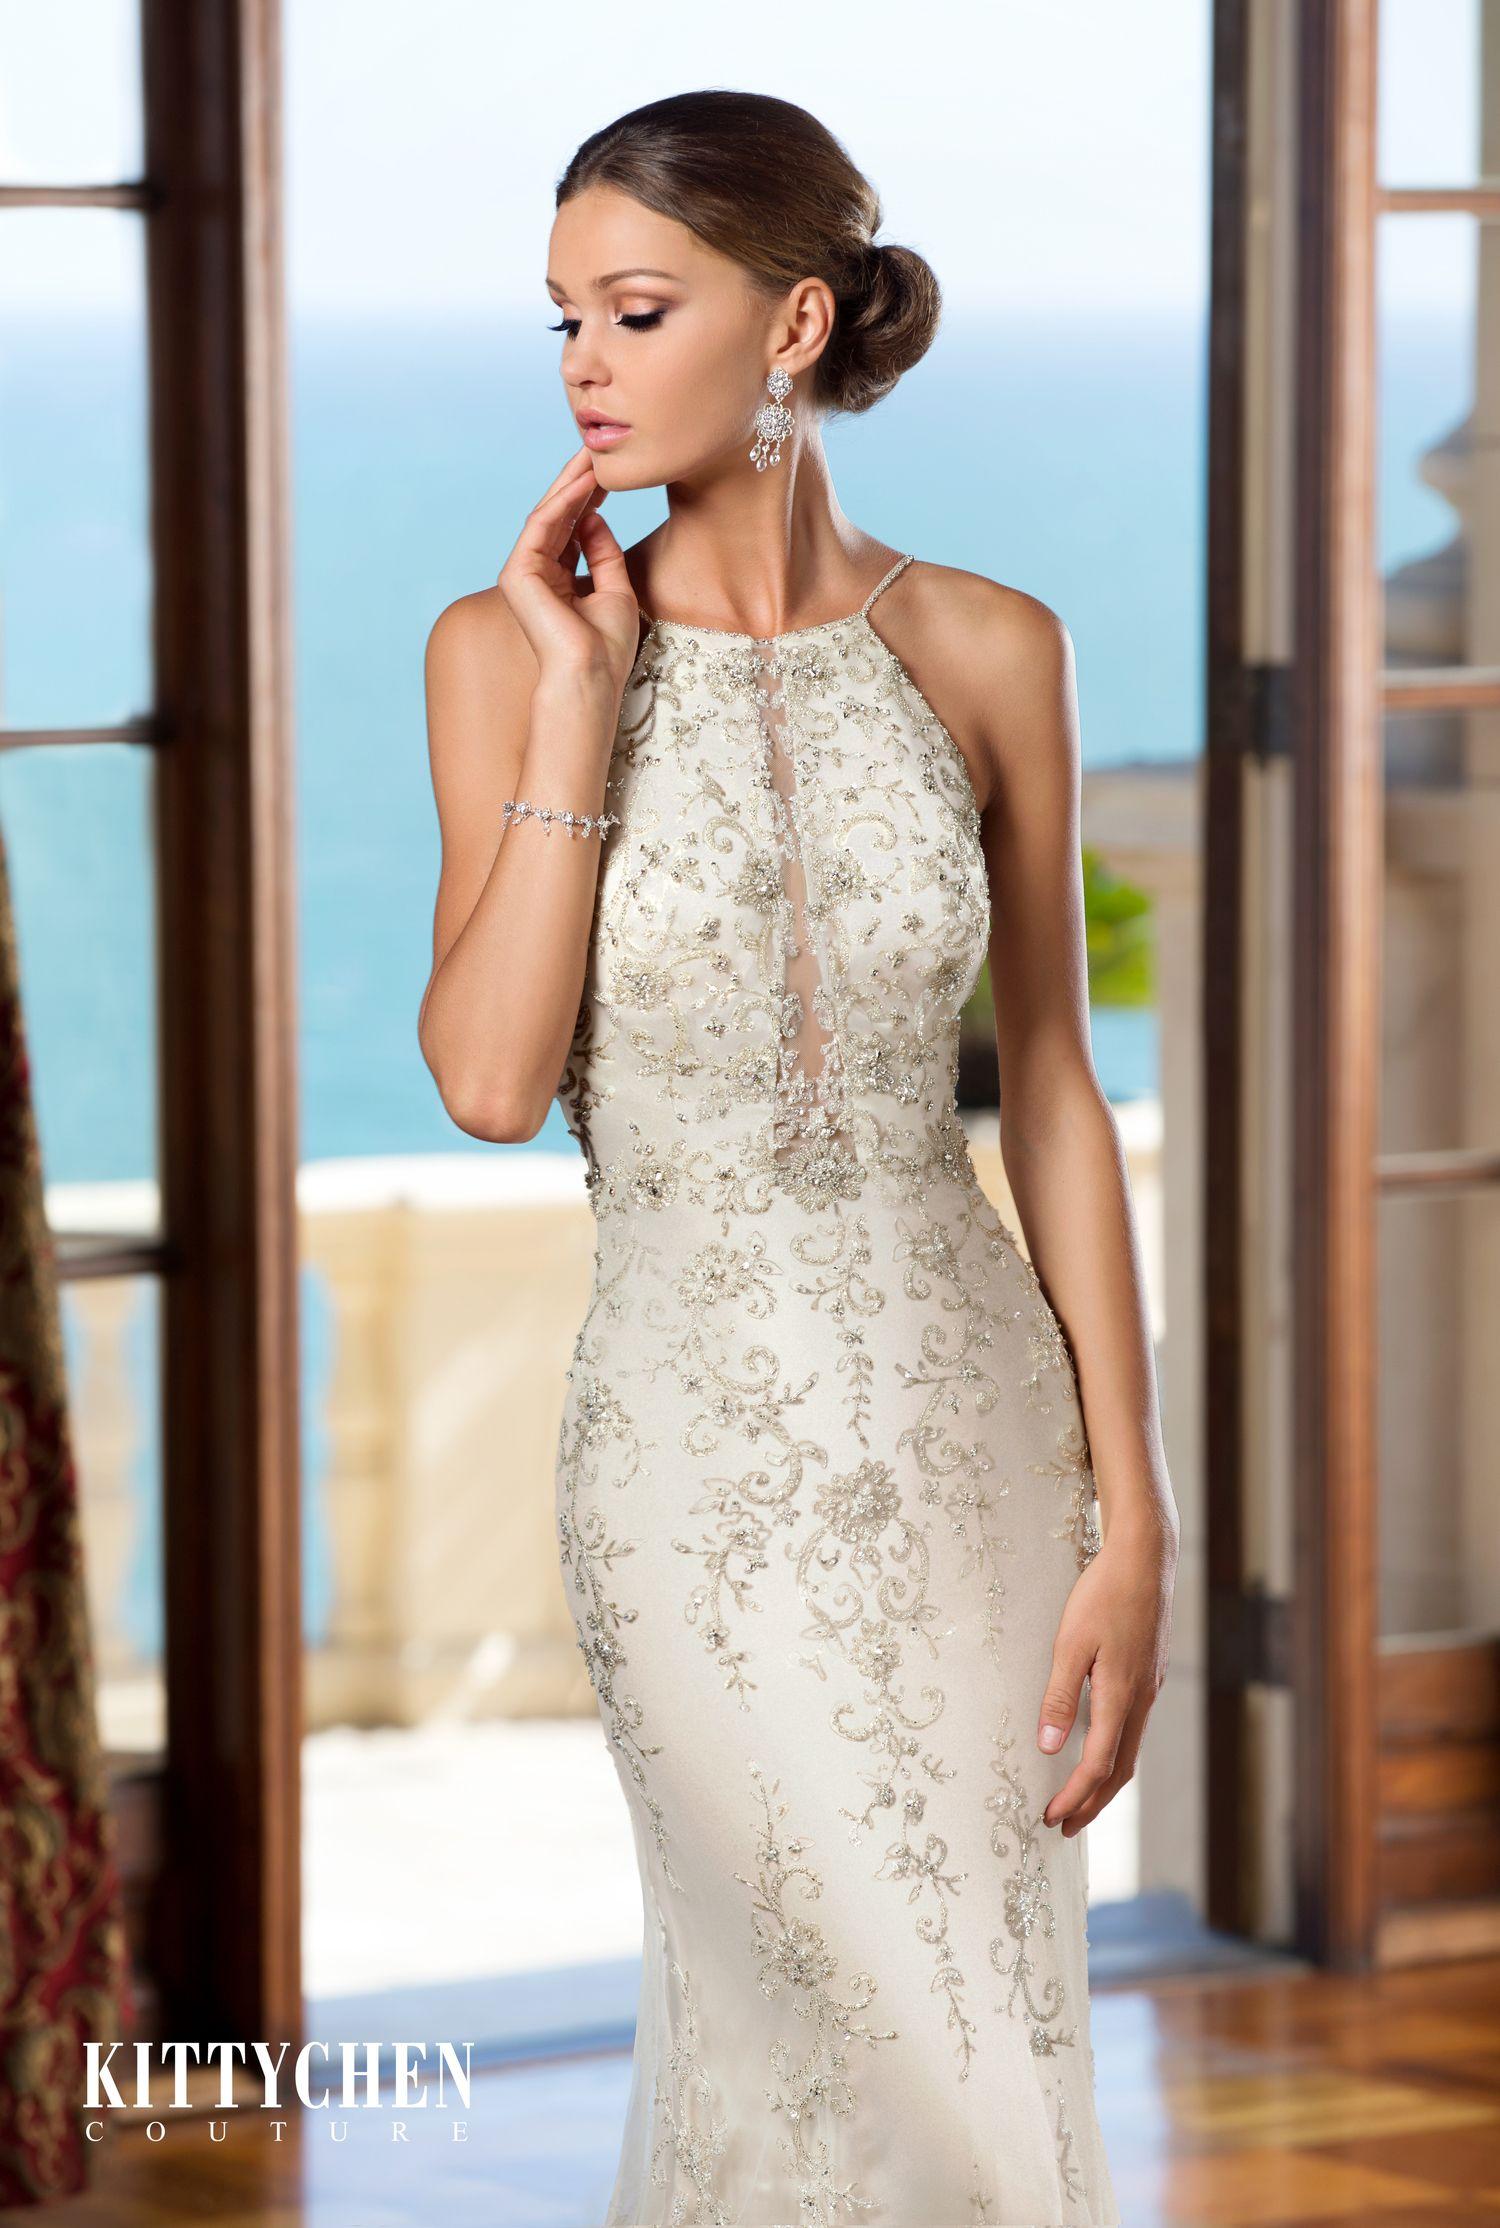 Kitty chen cher u shopivorybridal beautiful wedding dresses